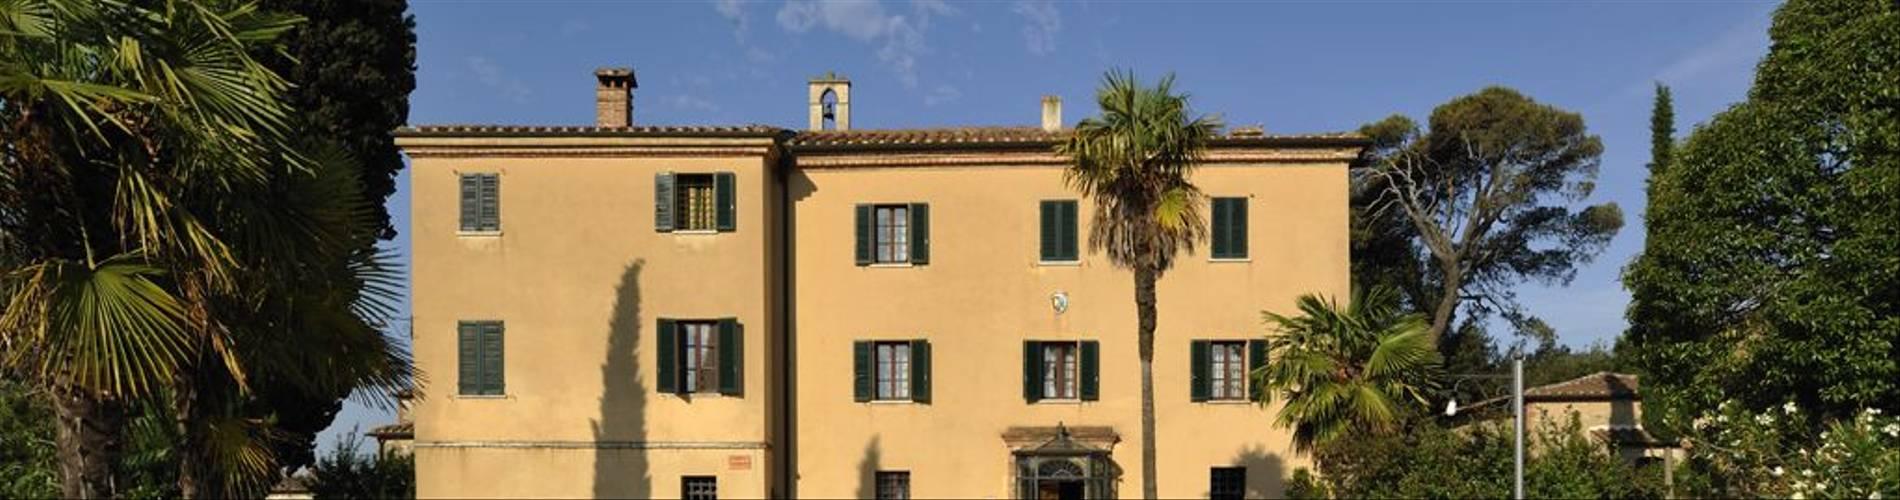 Borgo Casabianca 8.jpg